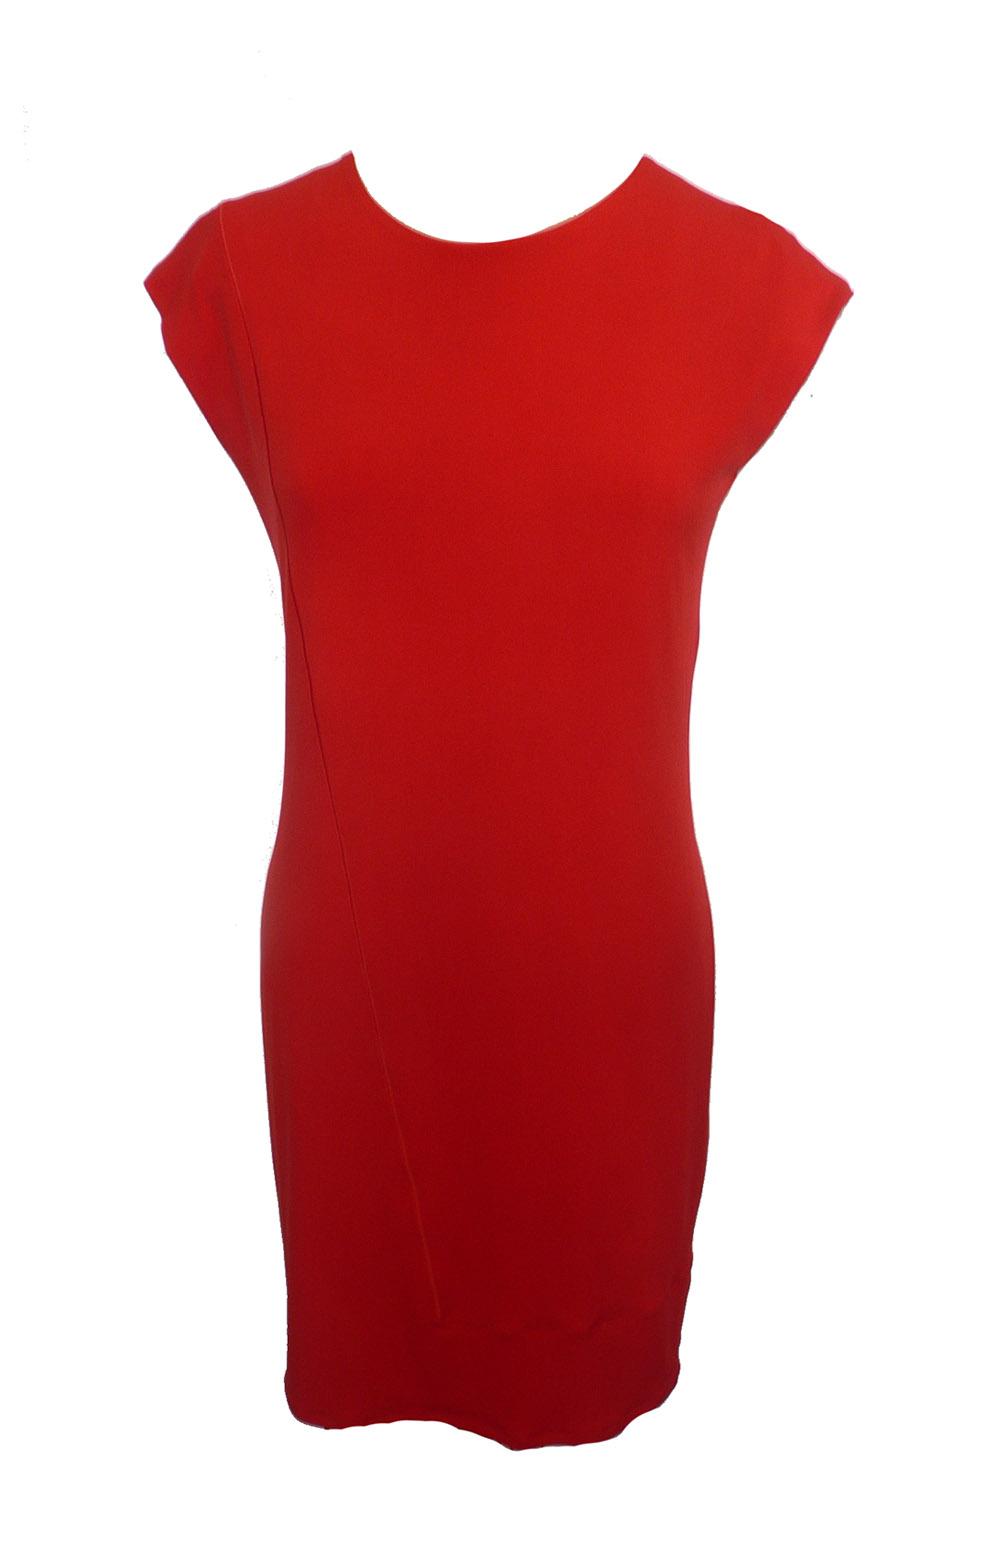 dress red cap sl eva v.jpg